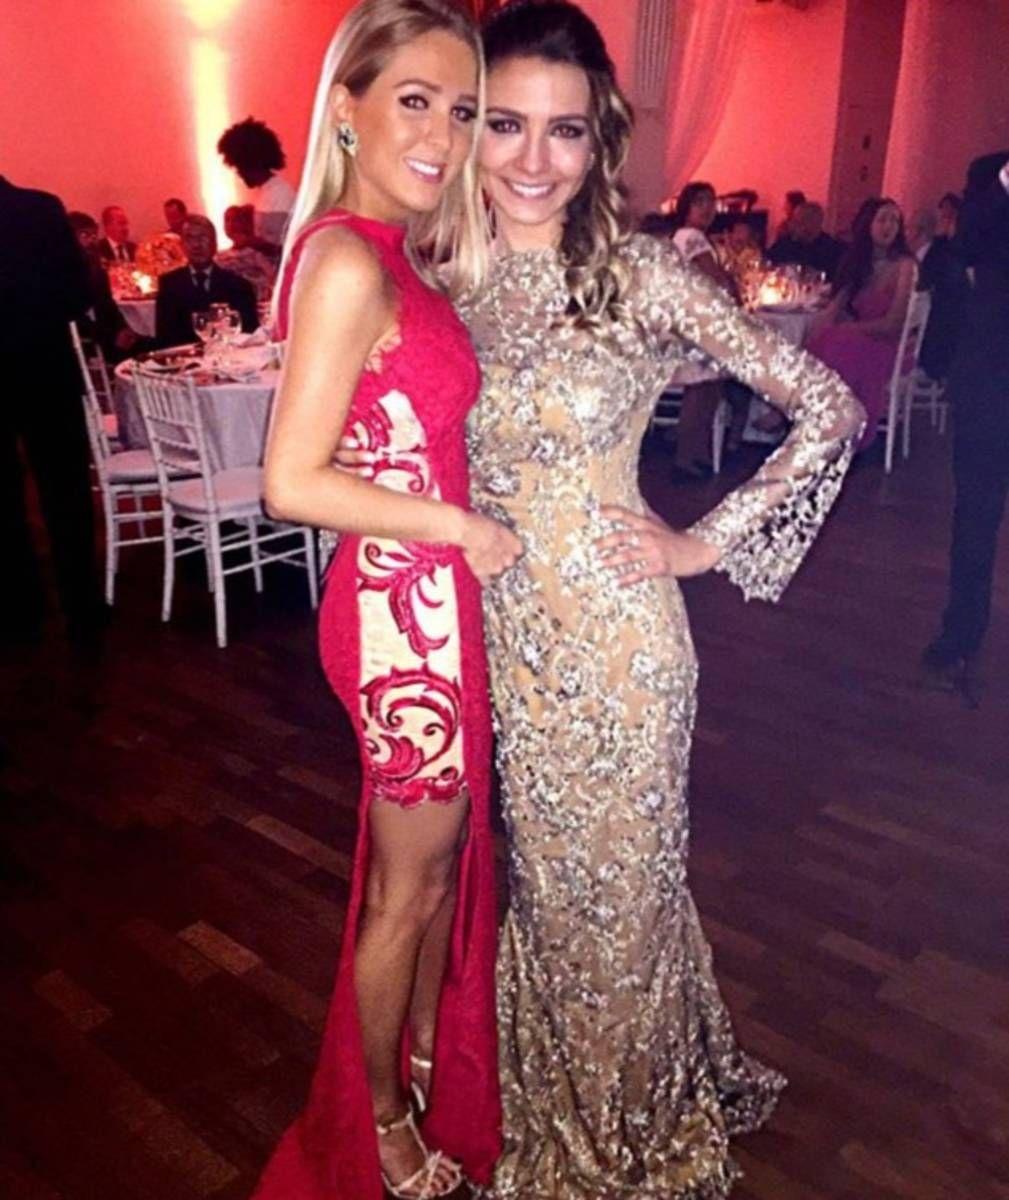 Vestido Fabulous Agilita Vermelho Vestido De Festa